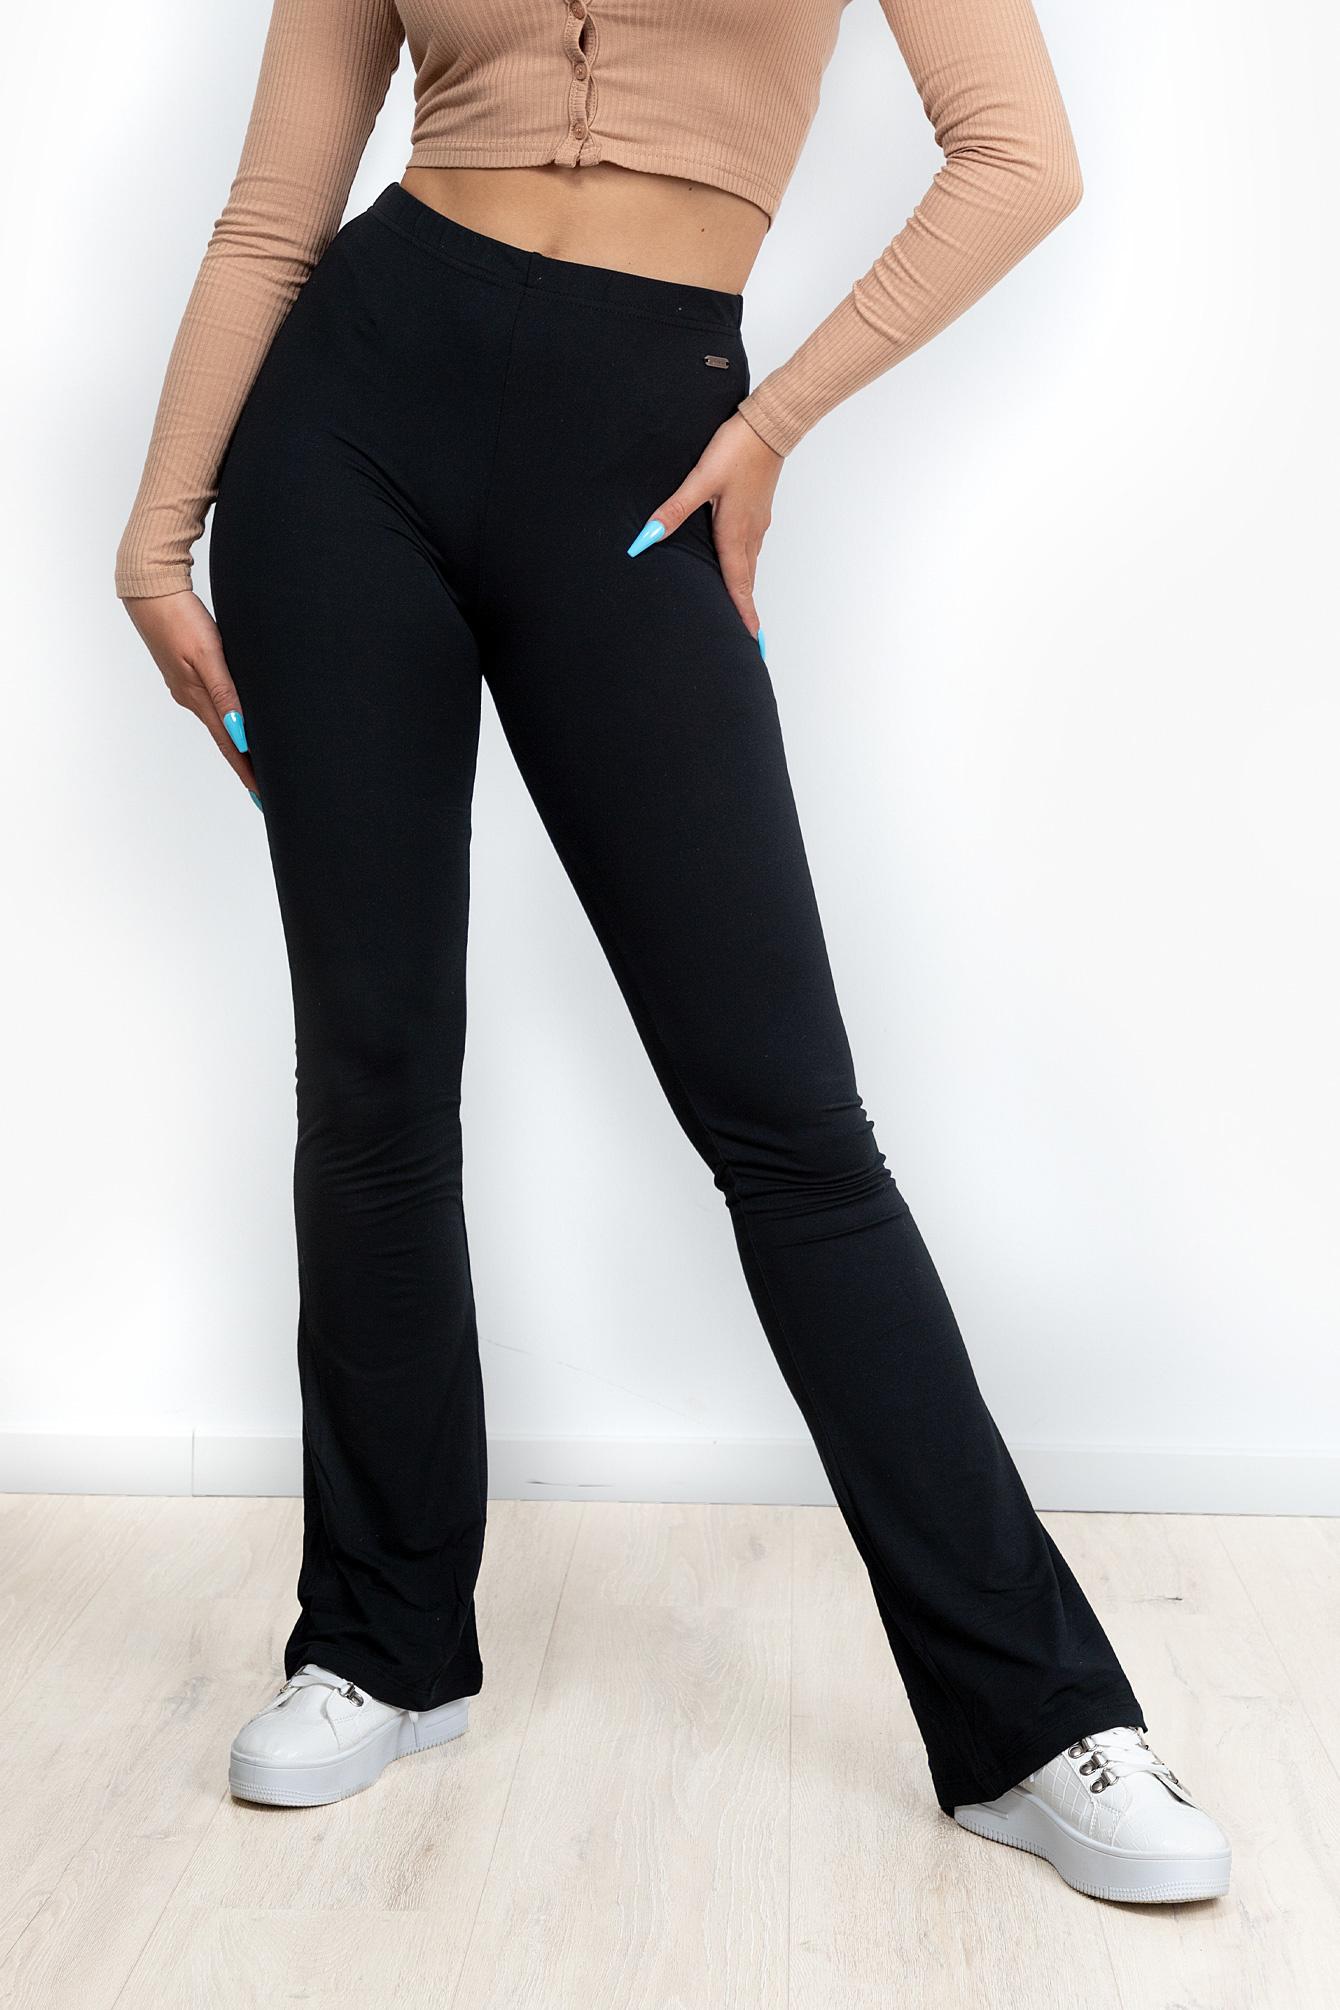 Flare broek Elodie zwart